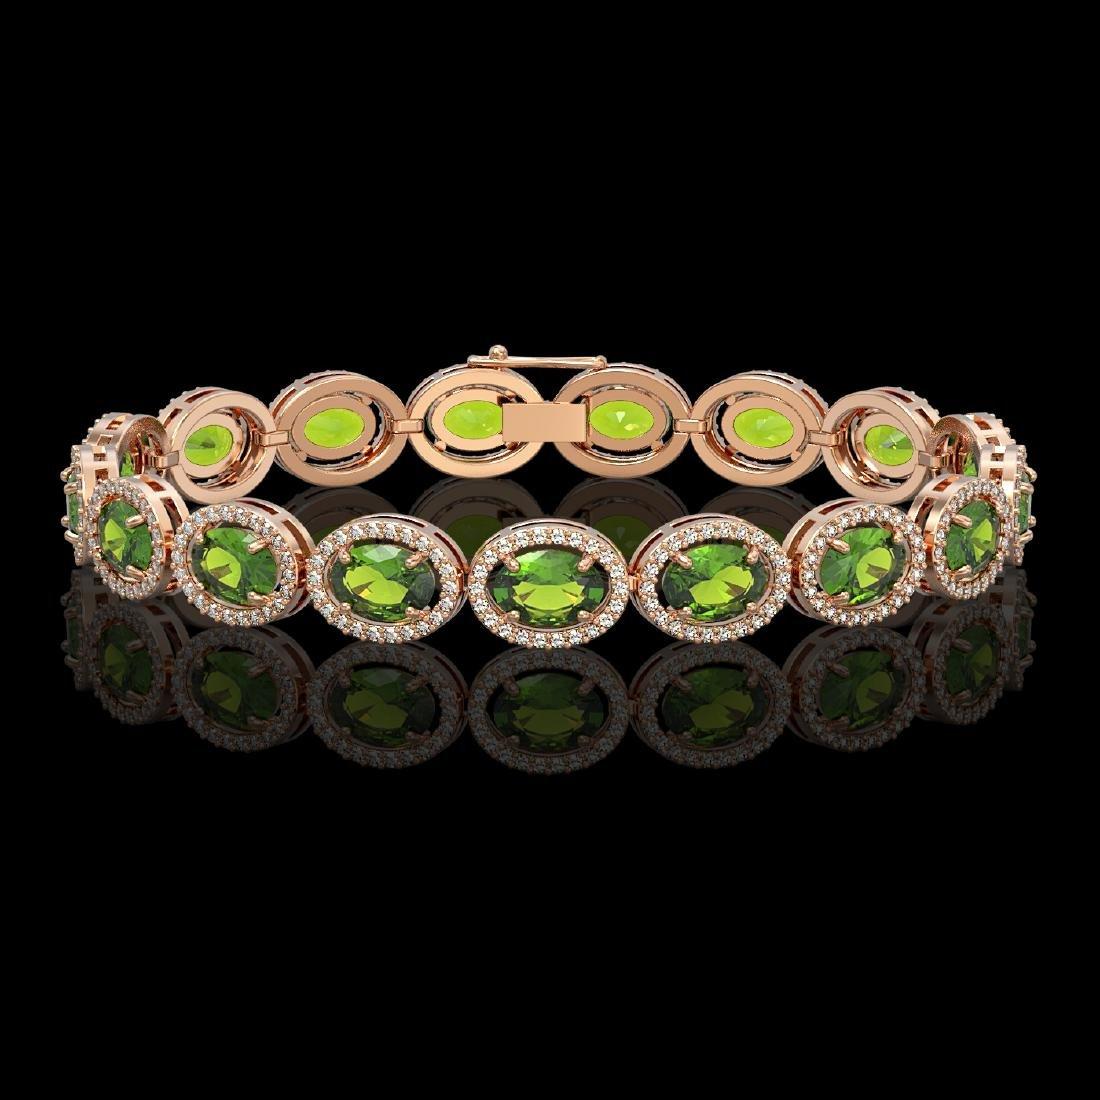 21.13 CTW Peridot & Diamond Halo Bracelet 10K Rose Gold